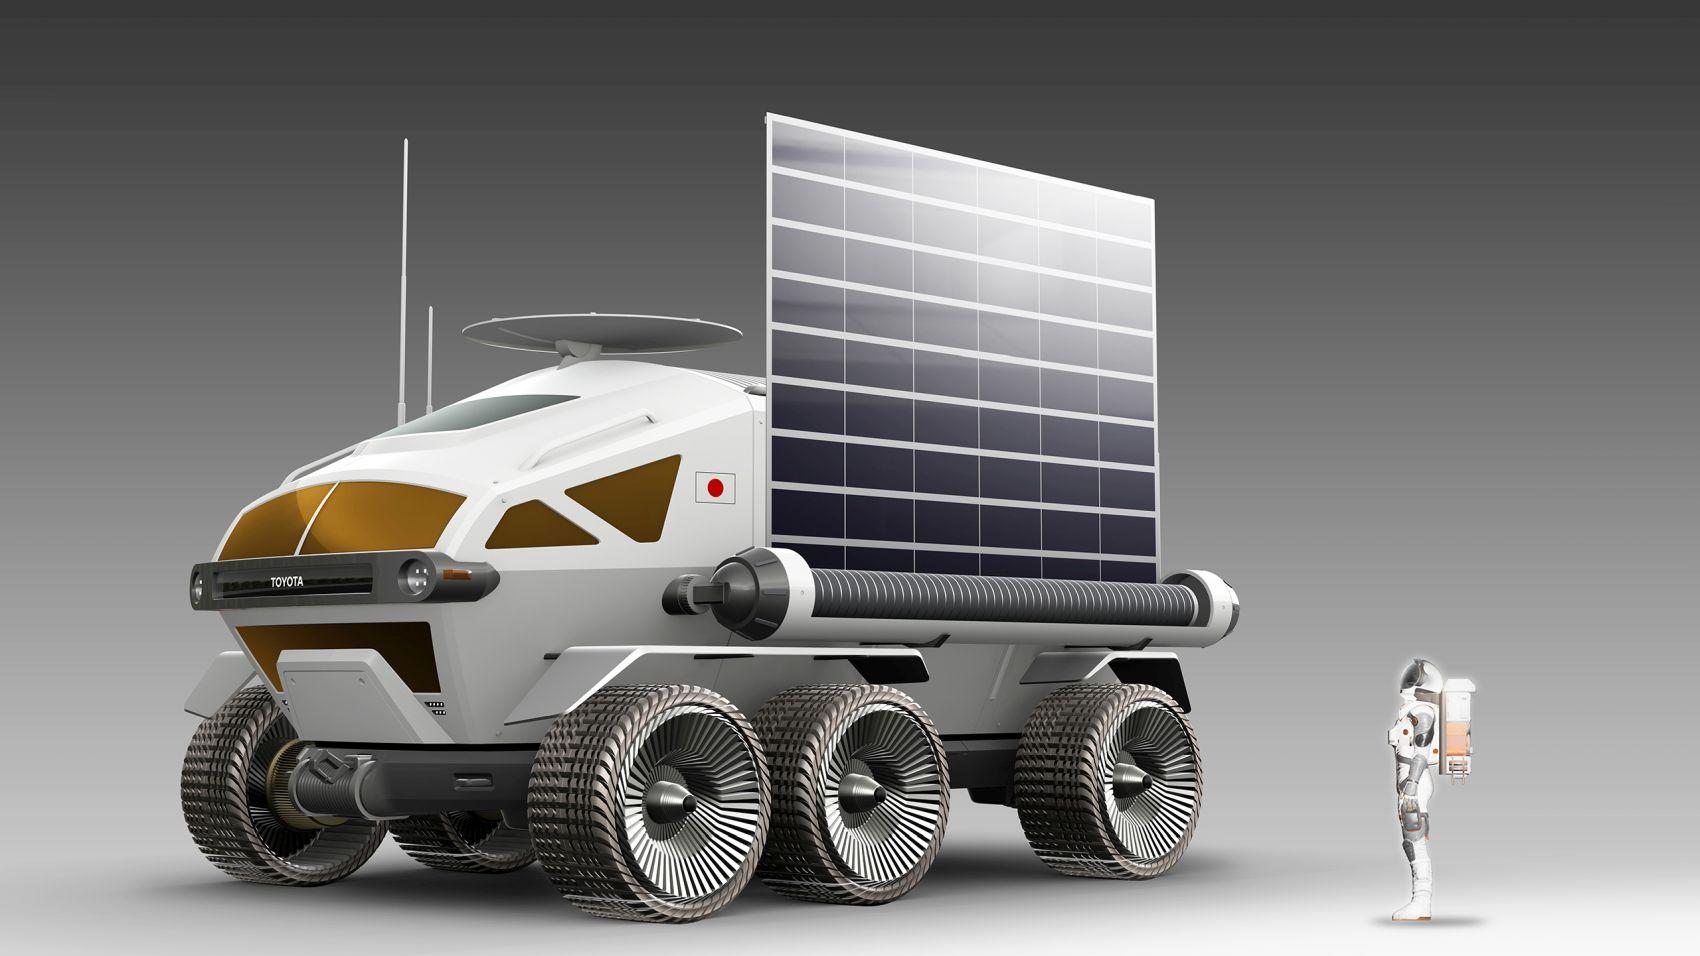 JAXA Toyota Space Exploration Future Lunar Mobility 005